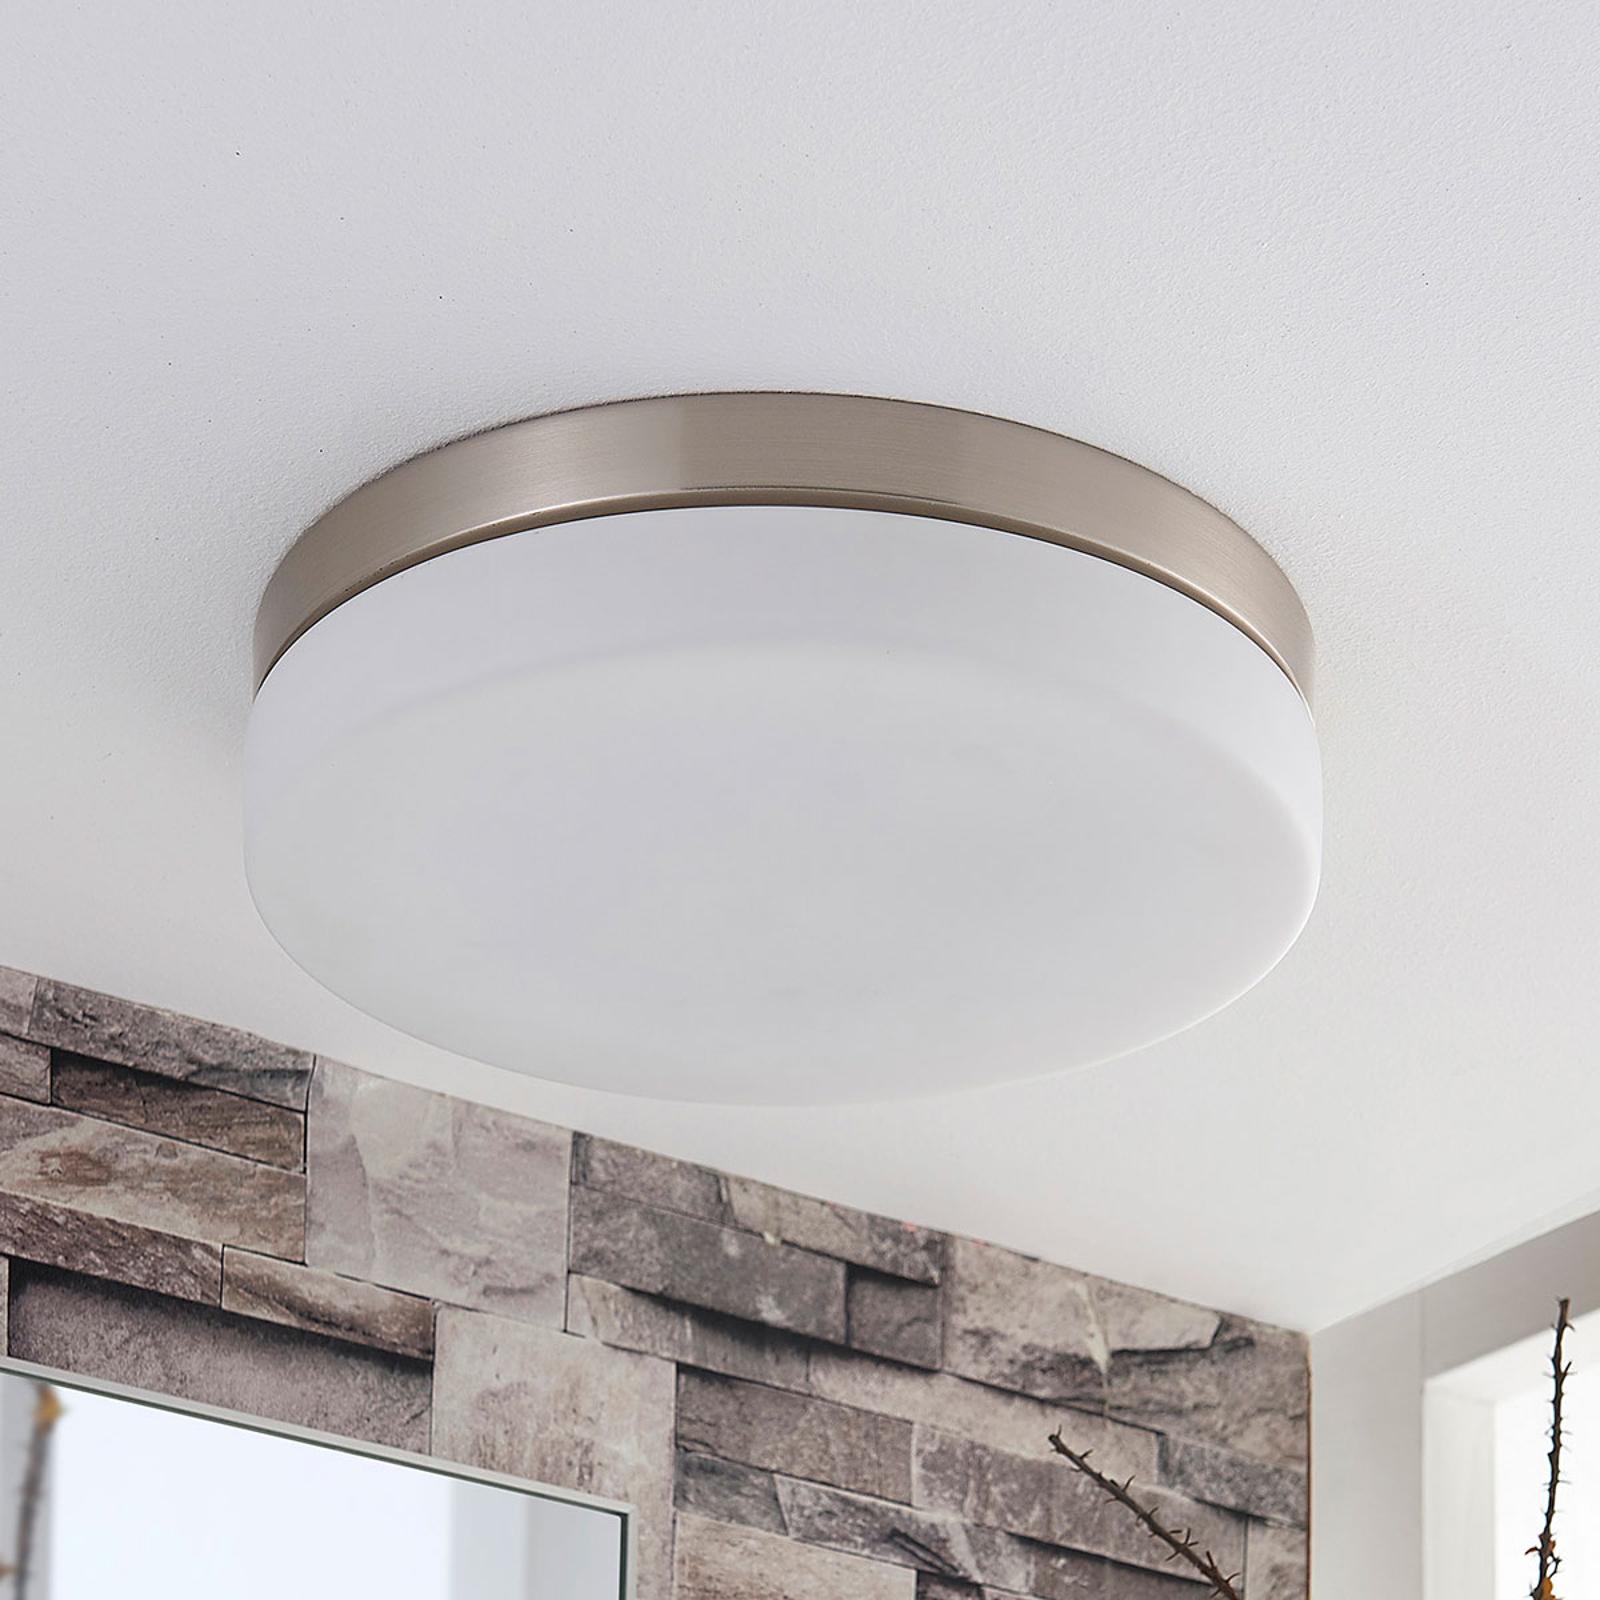 Bílá stropní lampa Amilia s niklovým rámem, IP44